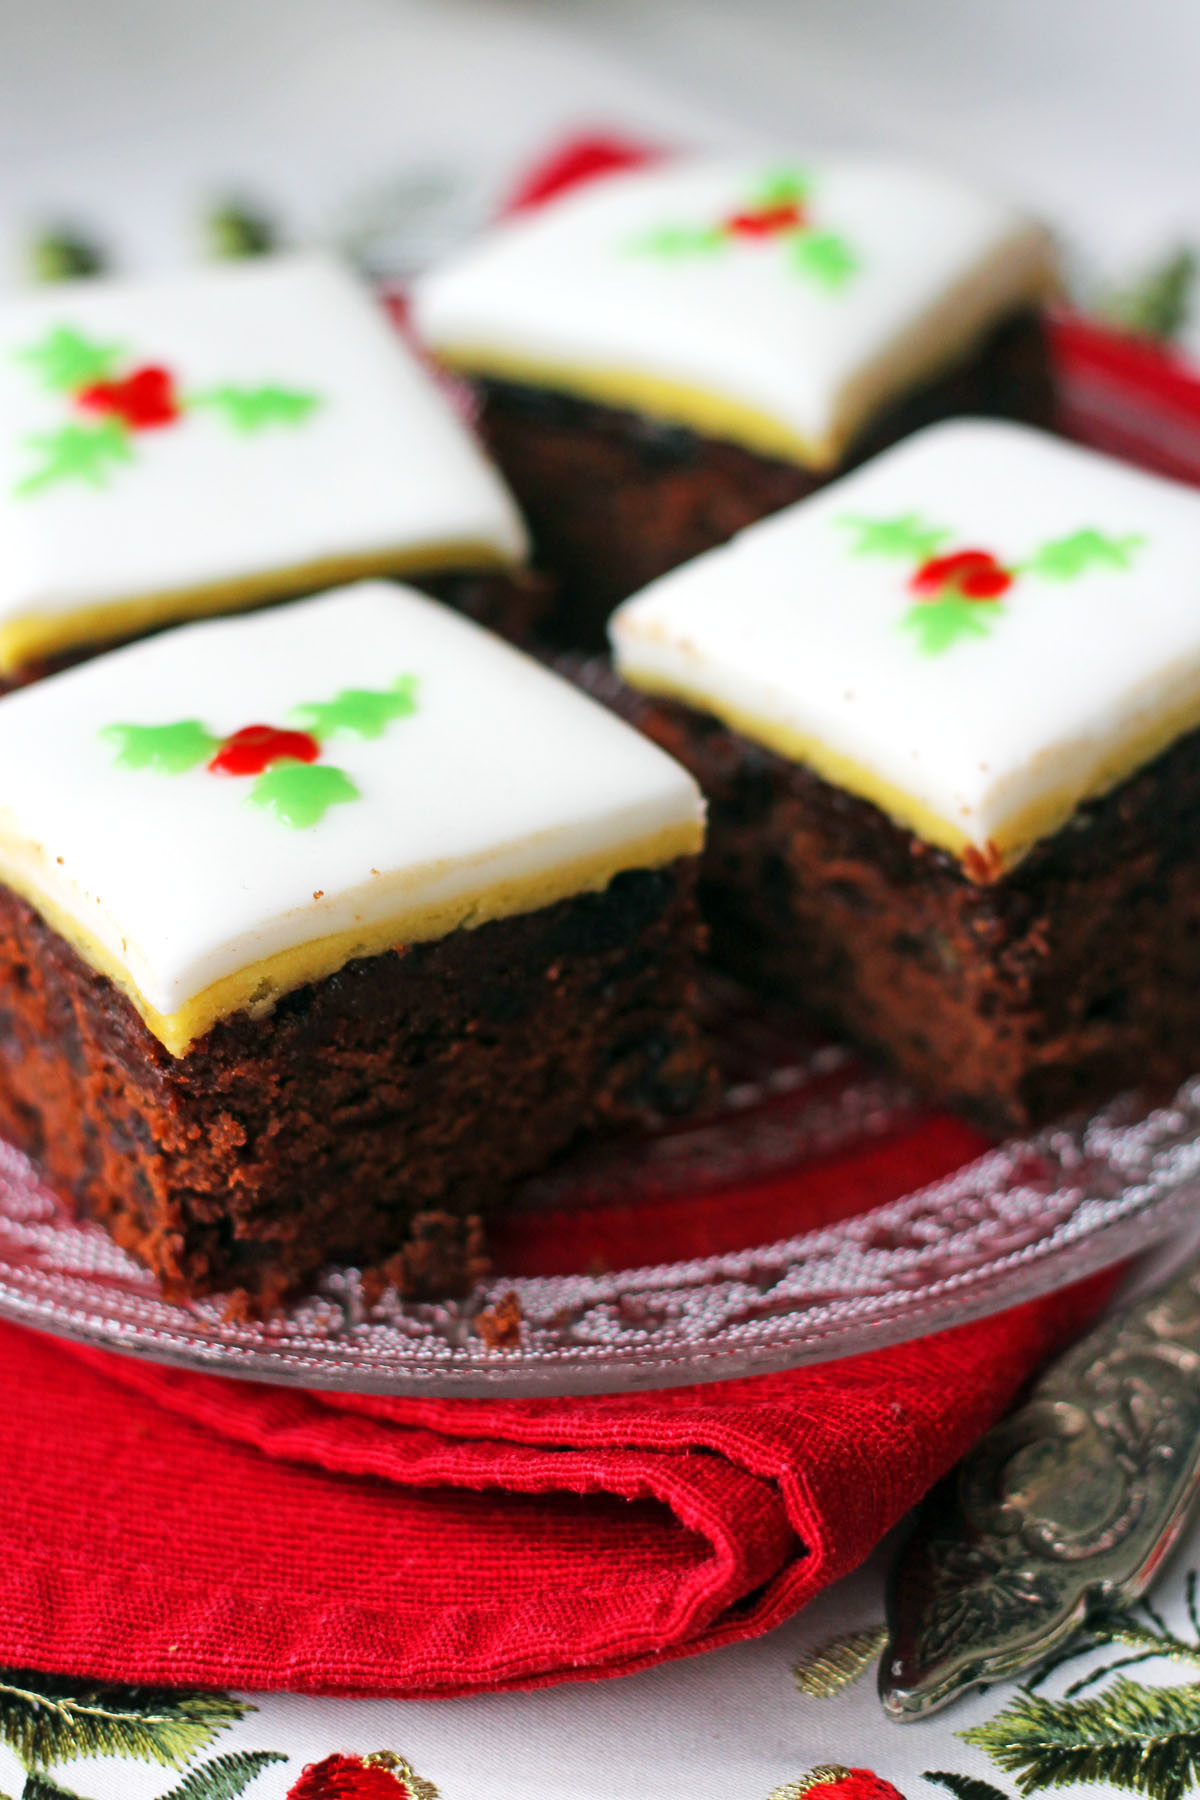 Cakes Recipes For Christmas  Christmas Chocolate and Orange Fruitcake